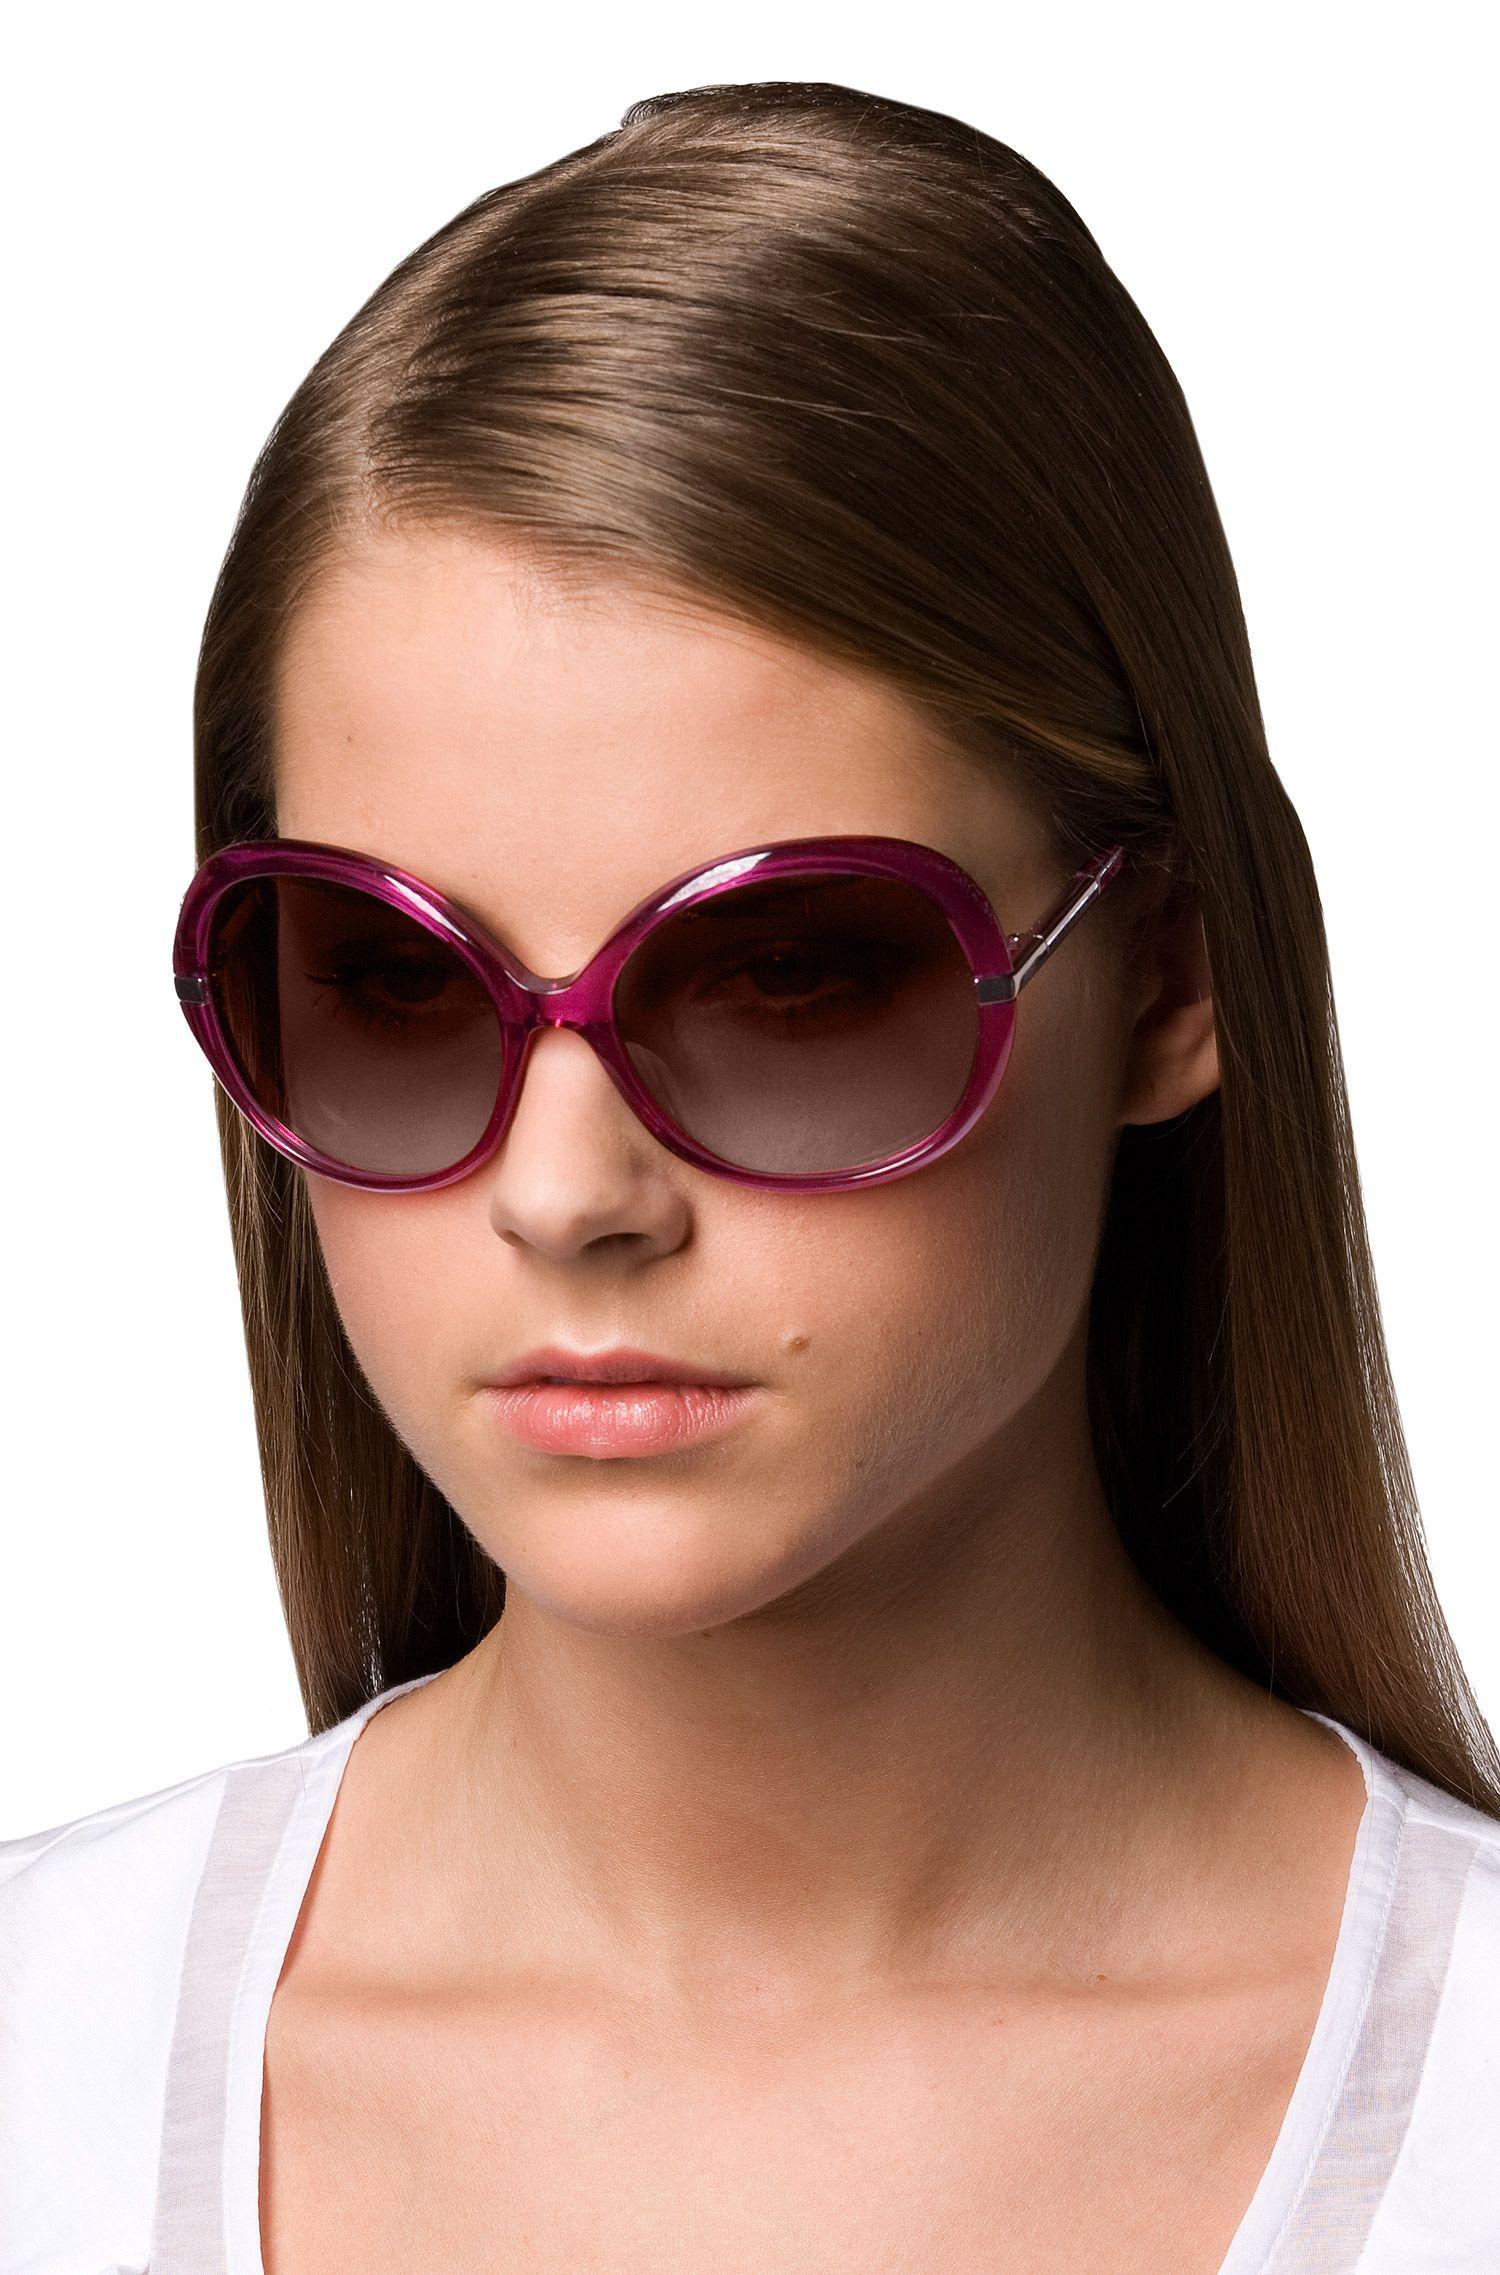 Damensonnenbrille im Stil der 70er